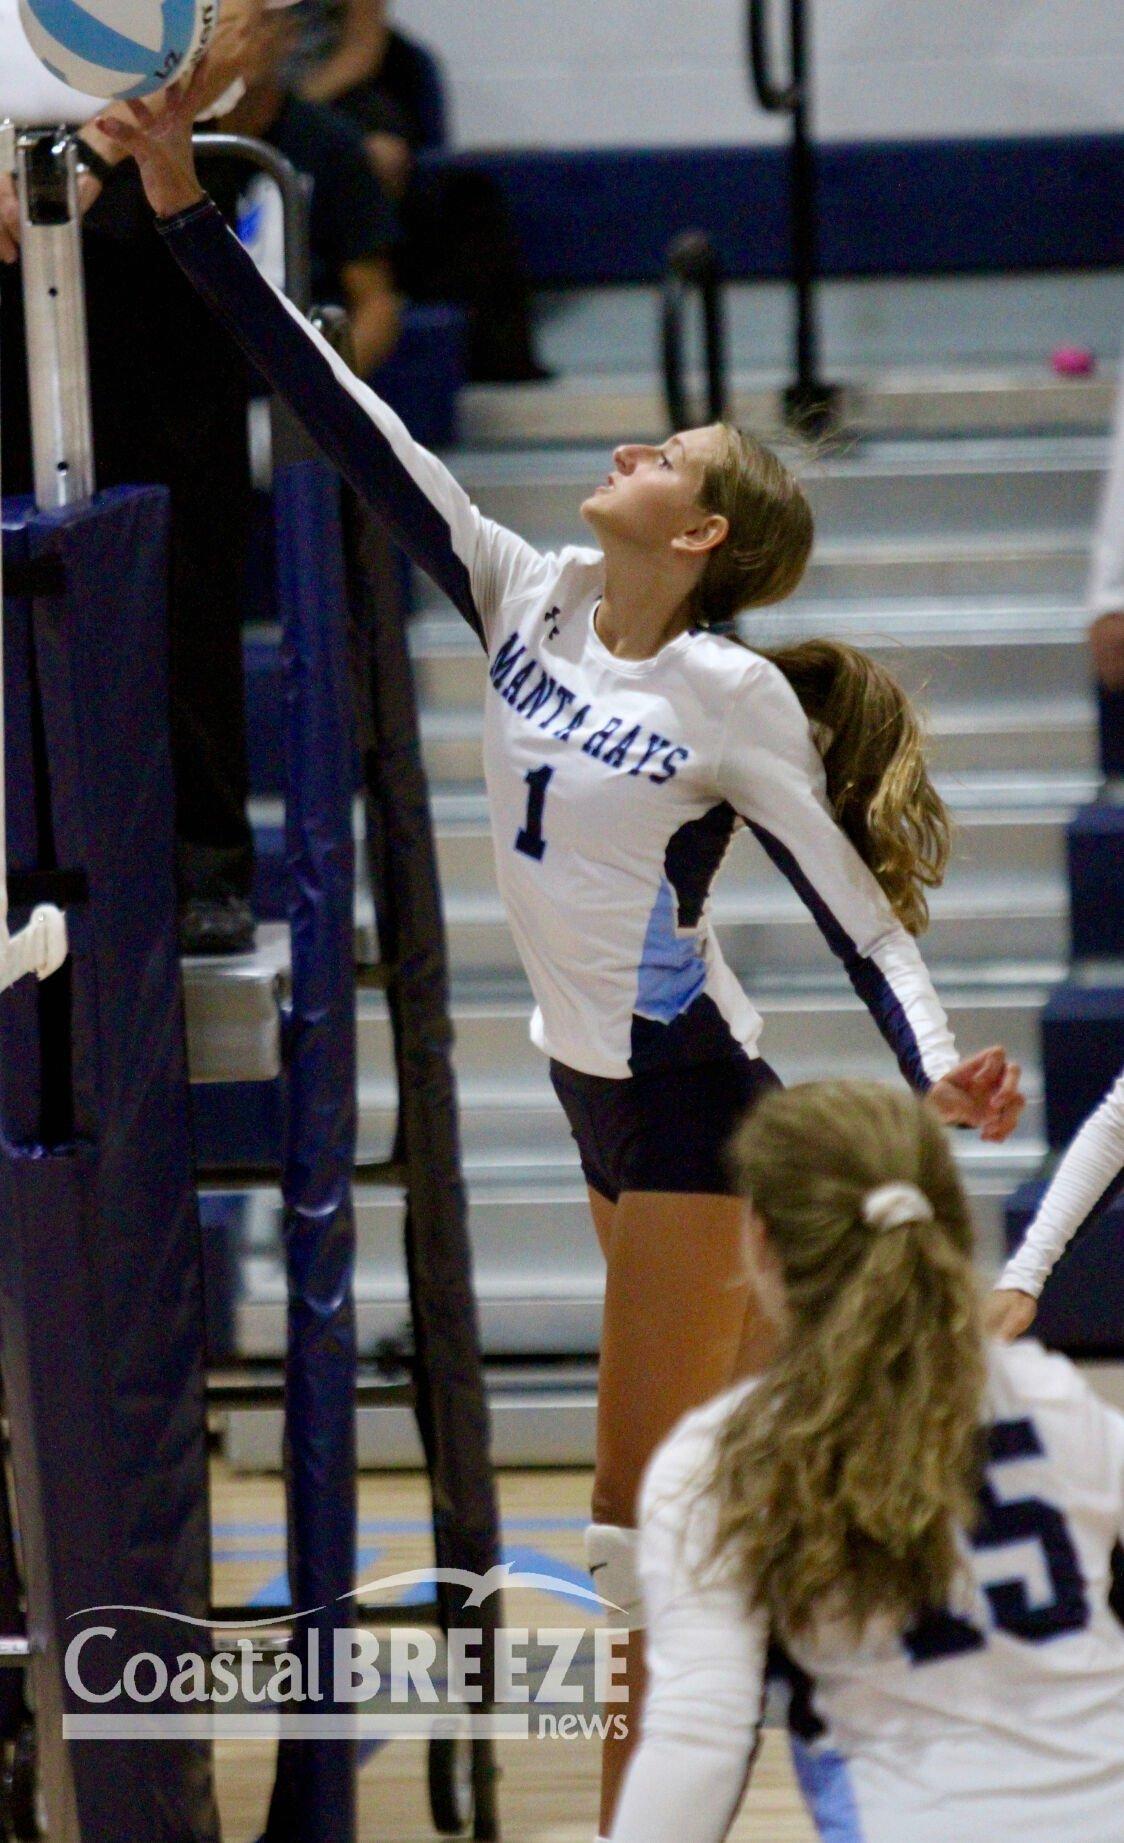 MIA_3. Sophomore Jenna Ragan makes a play at the net..JPG